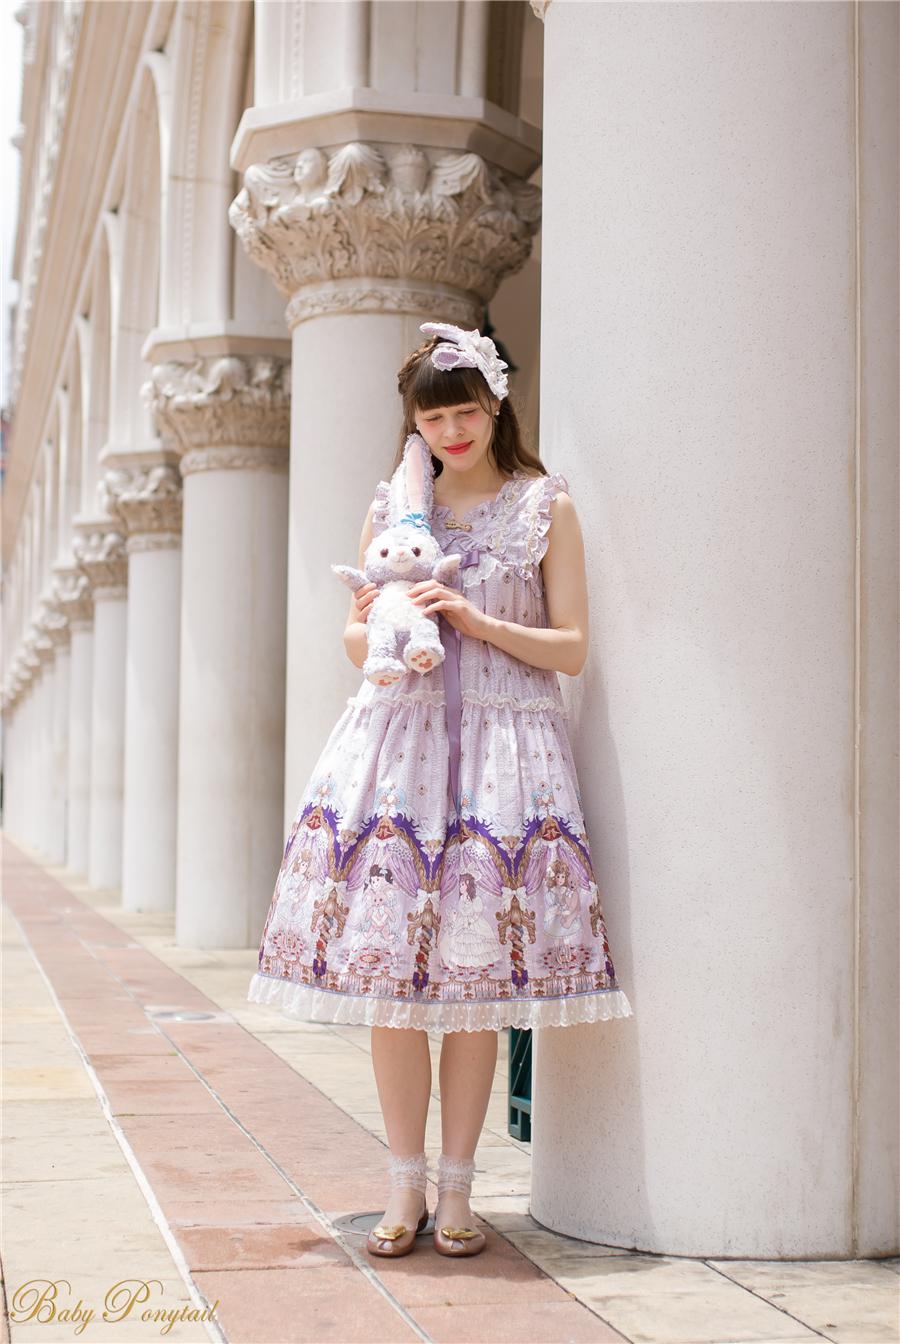 BabyPonytail_Model Preview_My Favorite Companion_Purple JSK_NG-1_Claudia_01.jpg